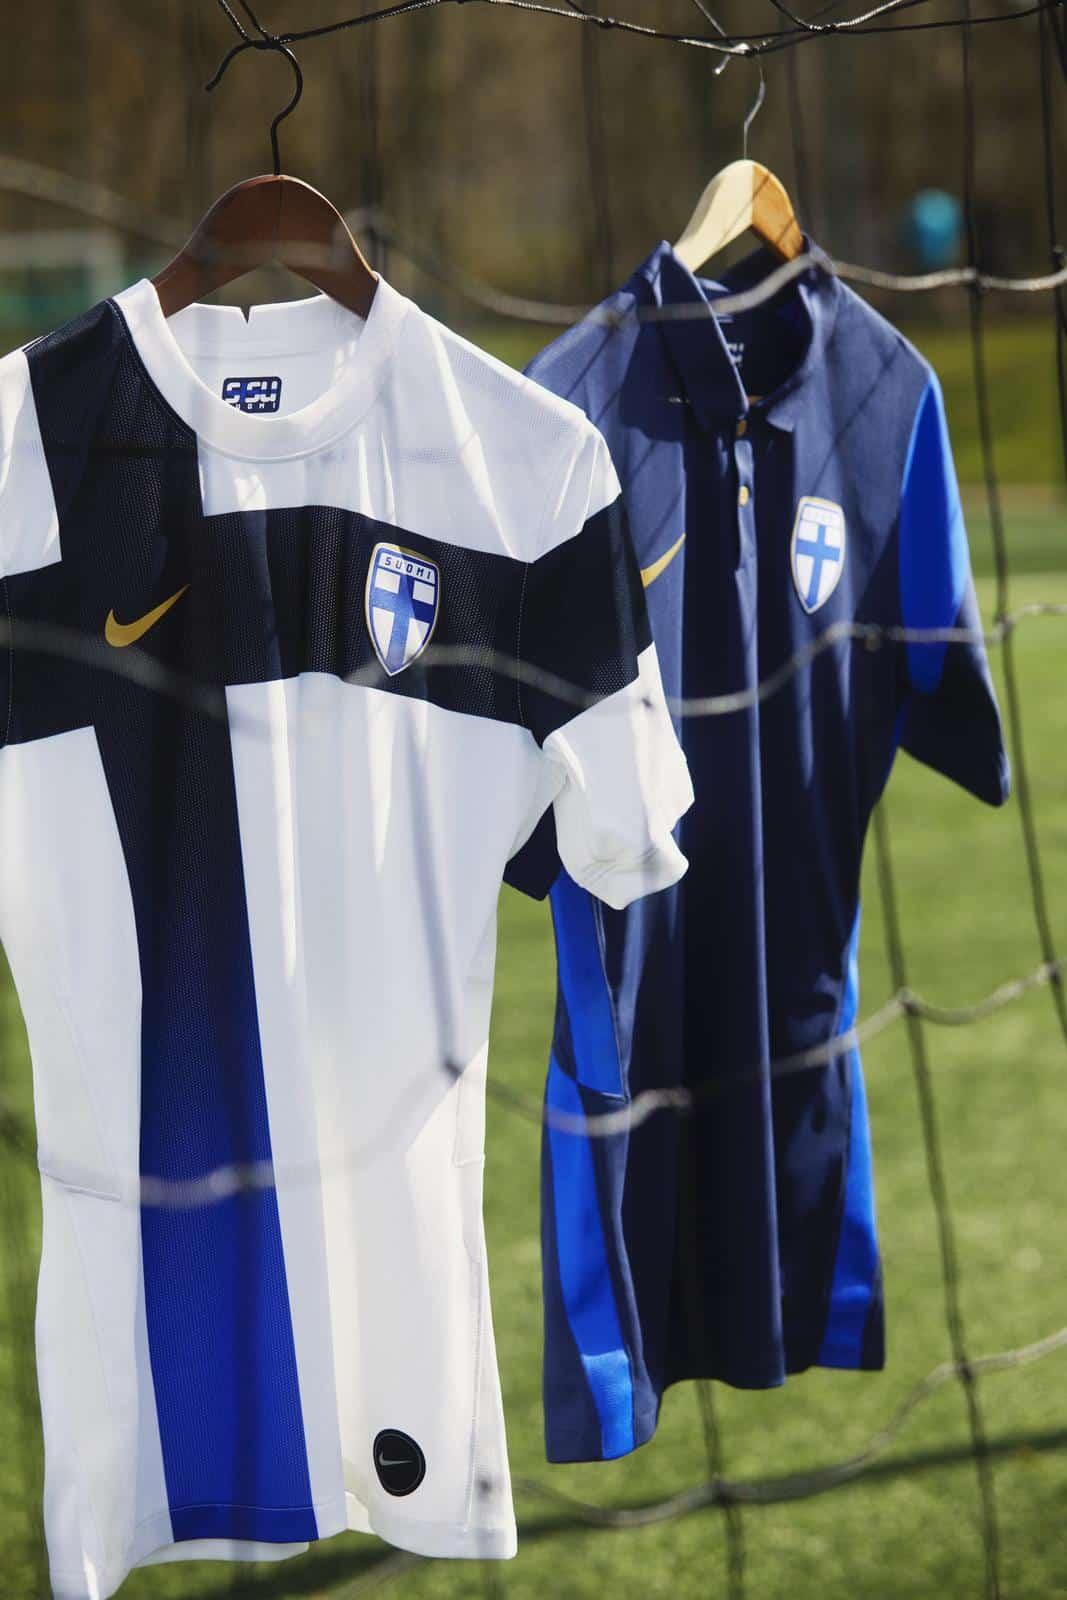 maillot-finlande-2020-2022-nike-3